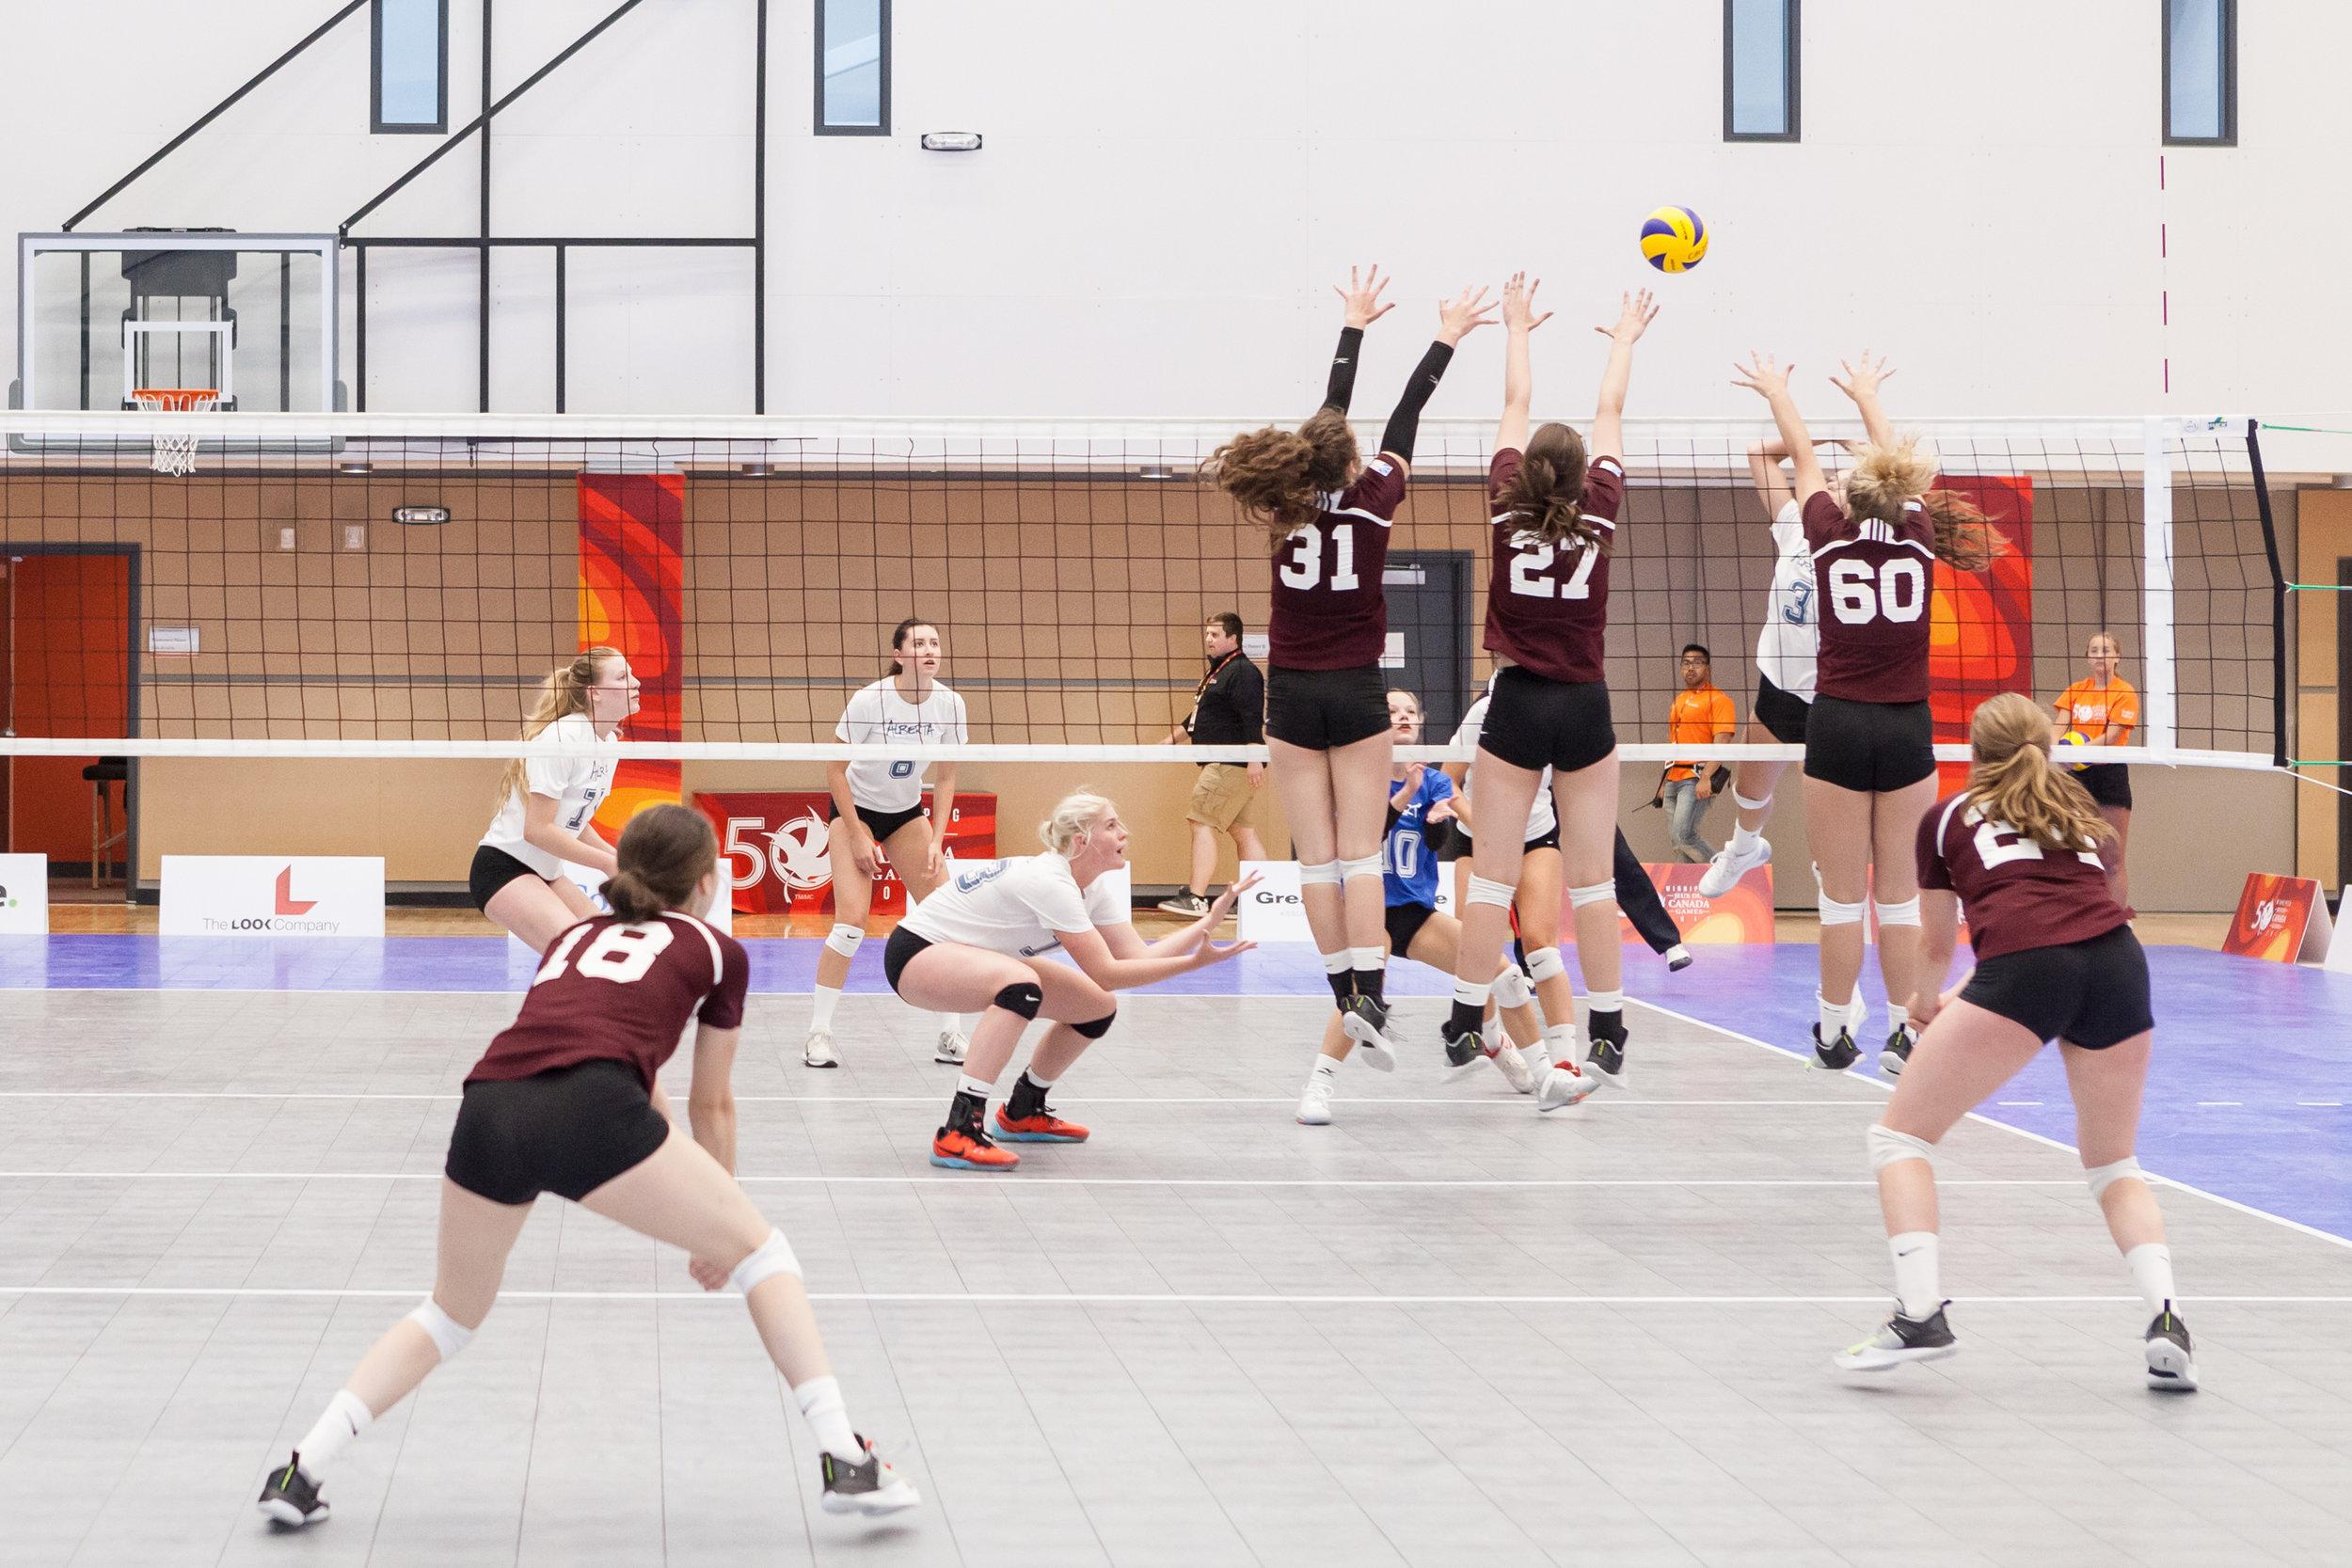 Canada Summer Games - Women's Volleyball